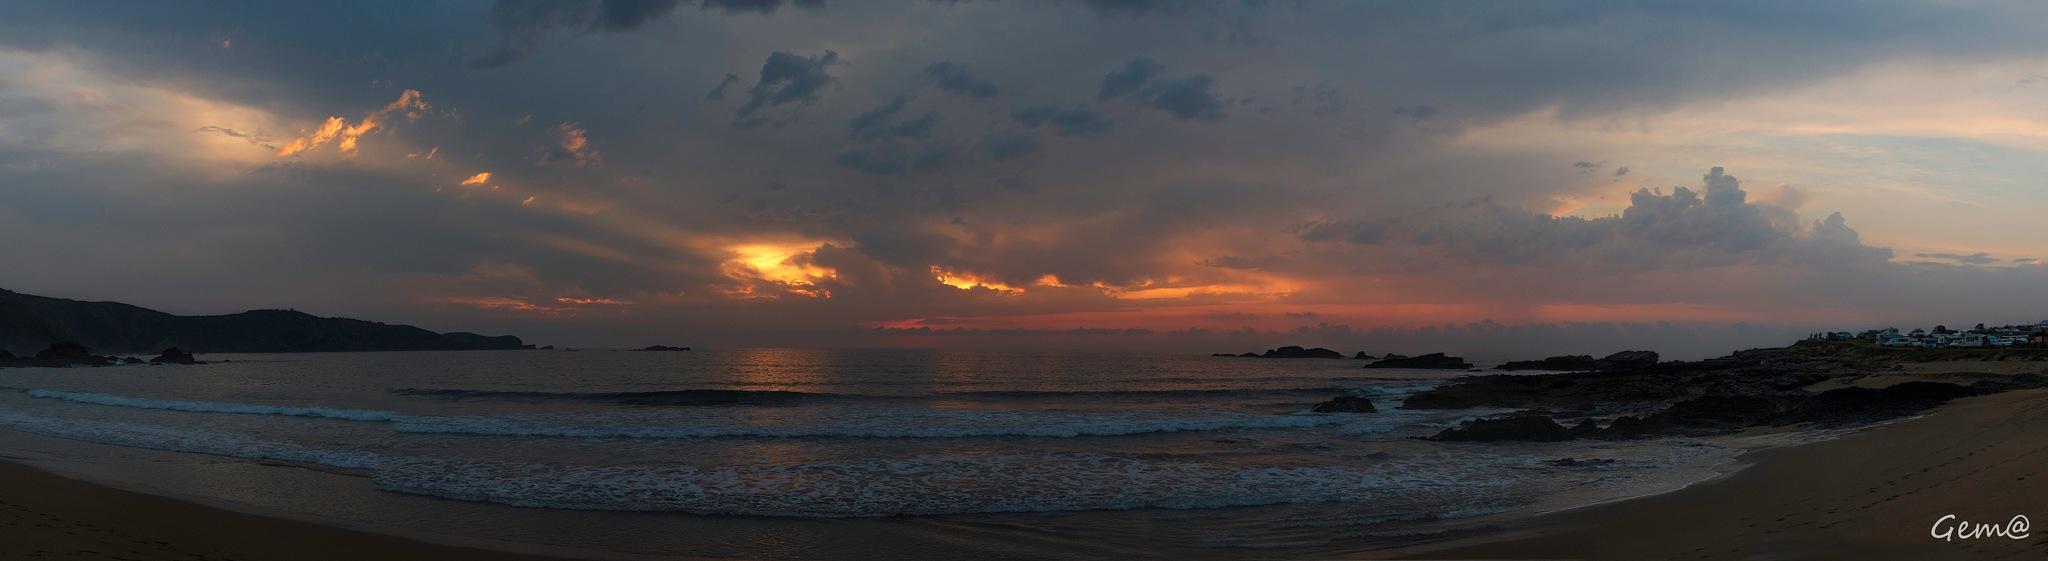 Sunset by Gema González